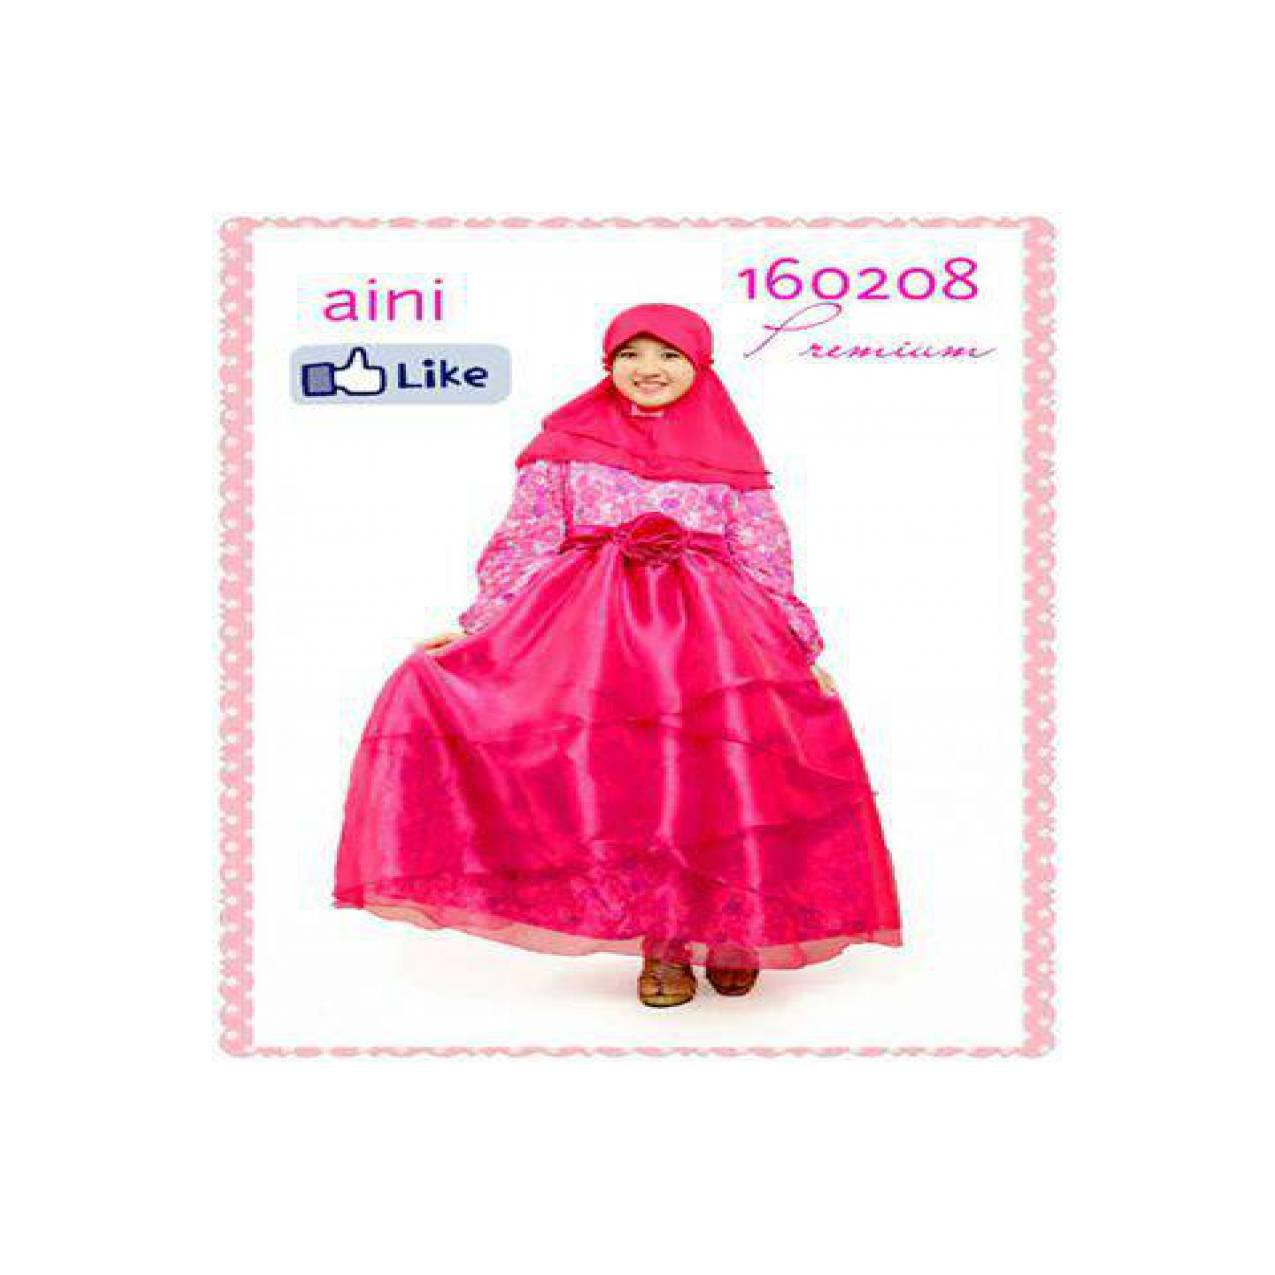 941ac60a88ee870cbc385a9d2d2fc4b9 Kumpulan Daftar Harga Gamis Modern Ala Hijabers Terbaru bulan ini